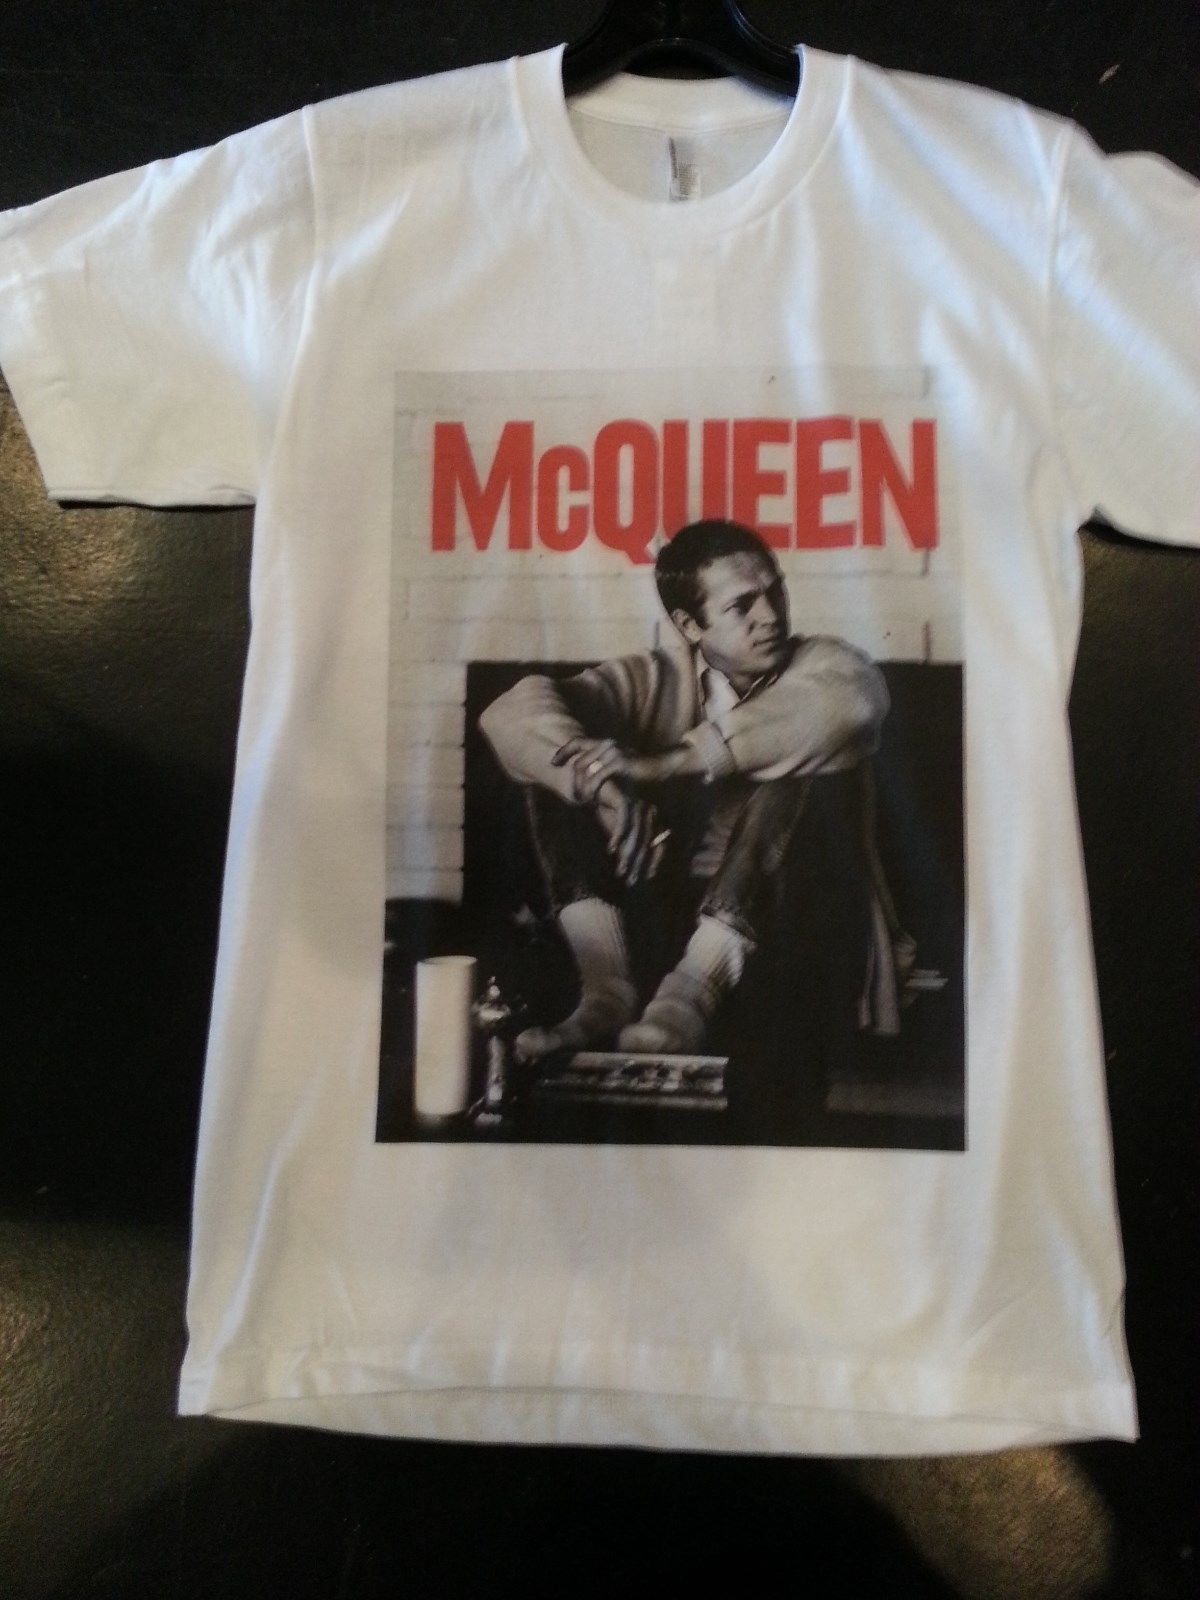 Steve Mcqueen T shirt cotton white Small, Medium, Large, Xlarge American Apparel